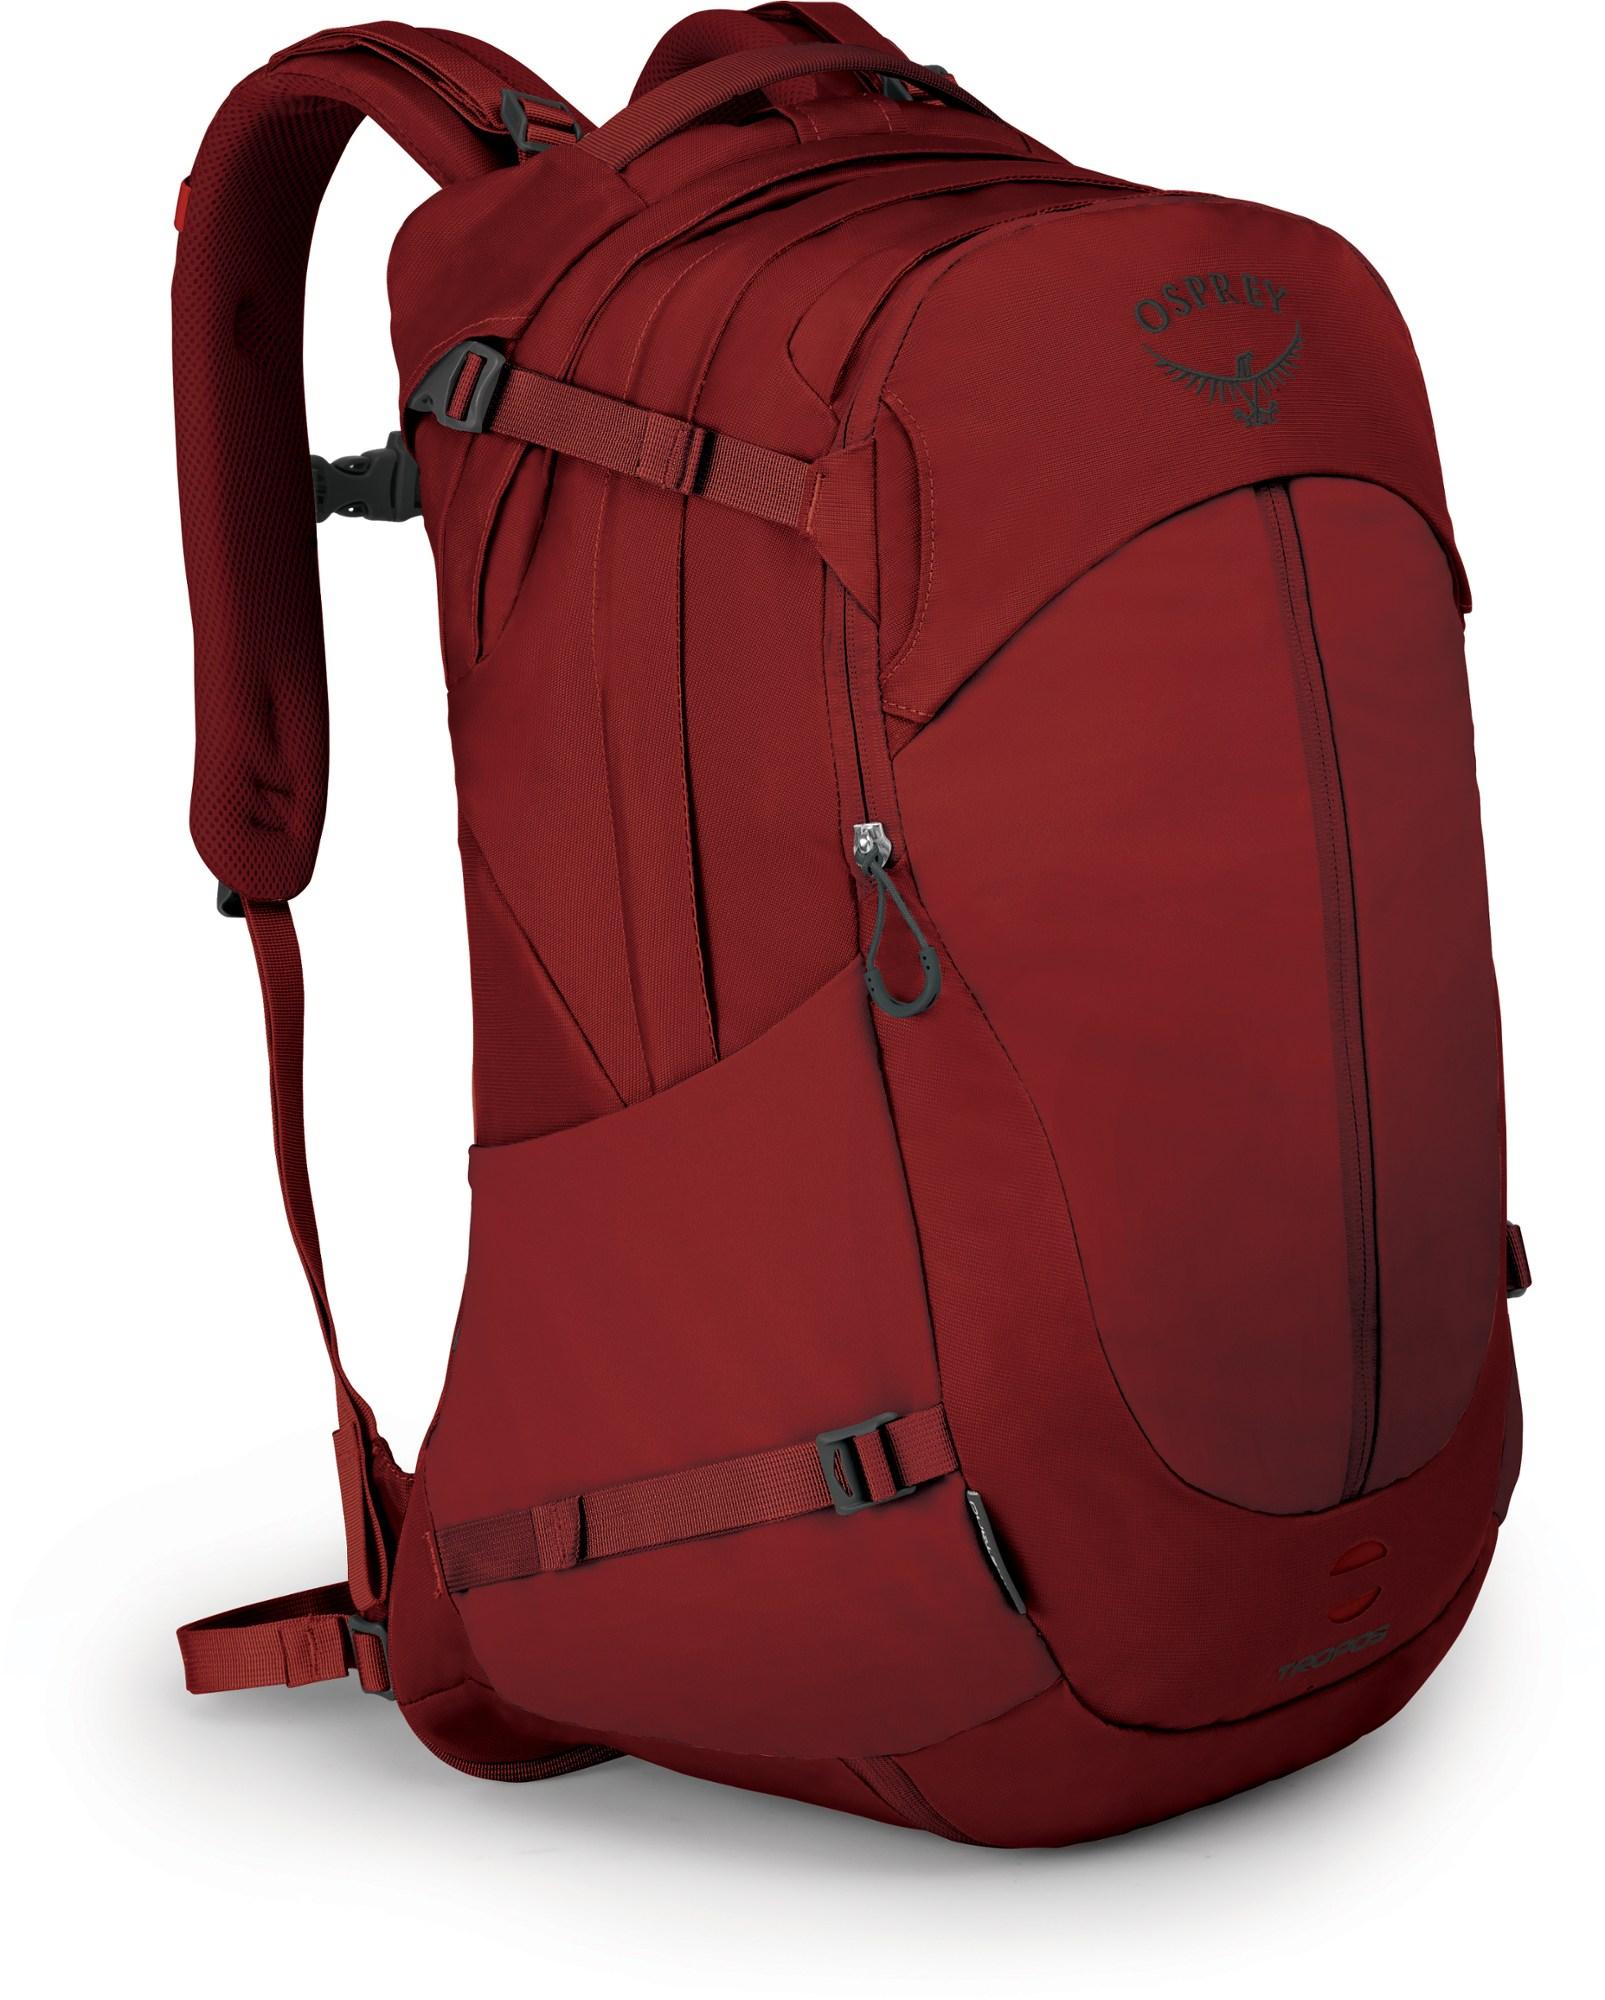 Osprey Tropos 34 L BackPack | REI Outlet - $96.73